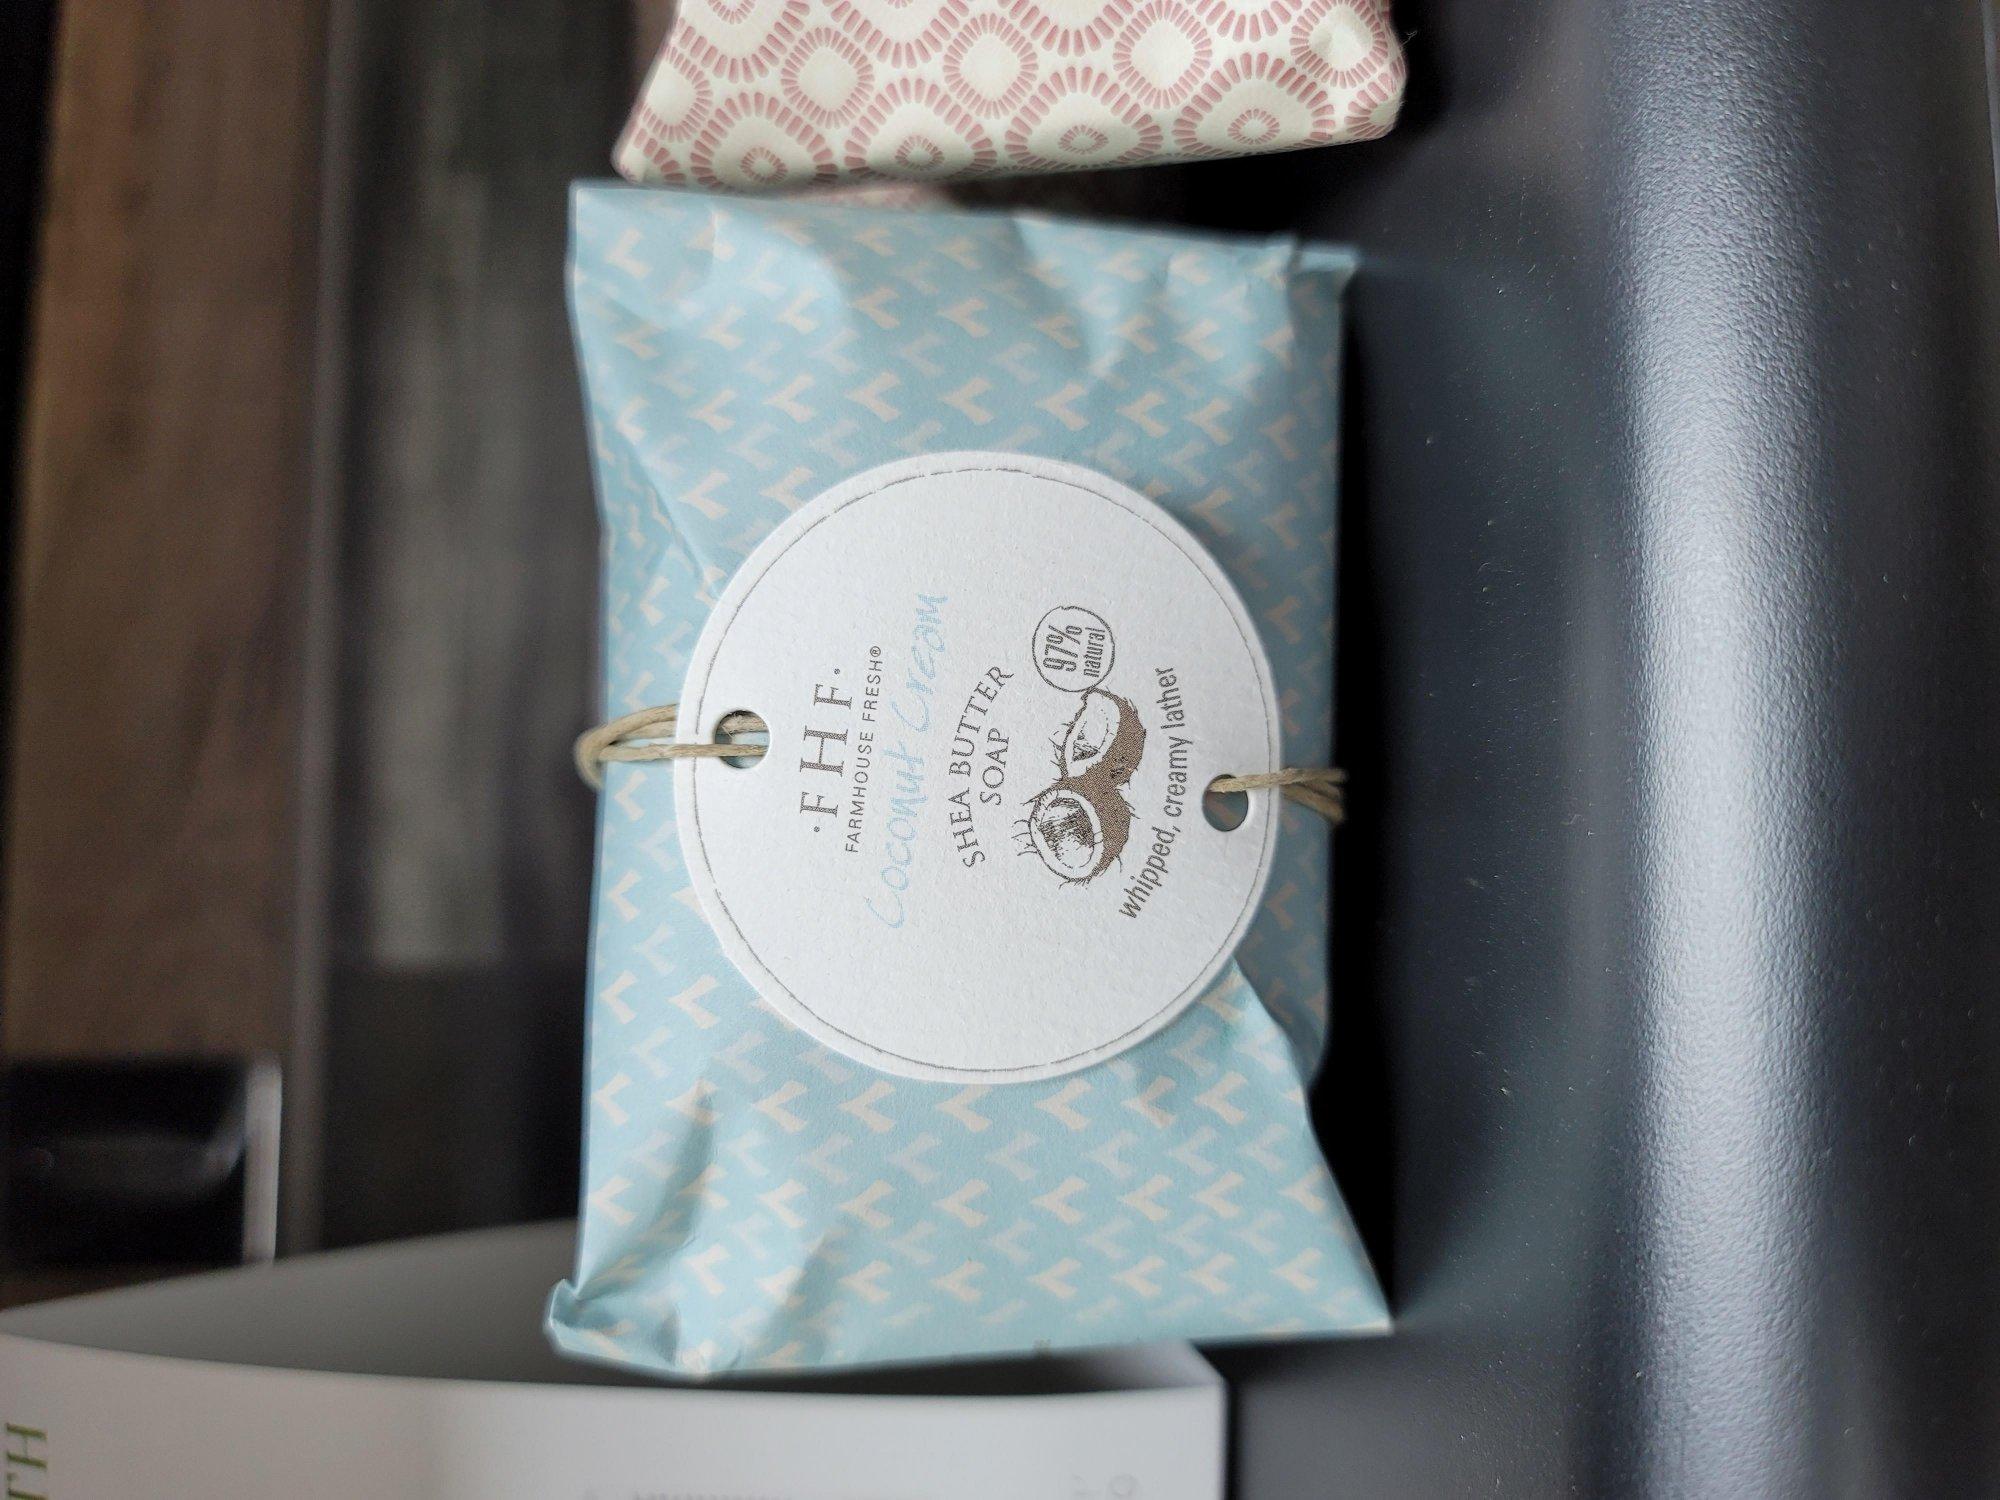 COCONUT CREAM SHEA BUTTER BAR SOAP 5.25 OZ